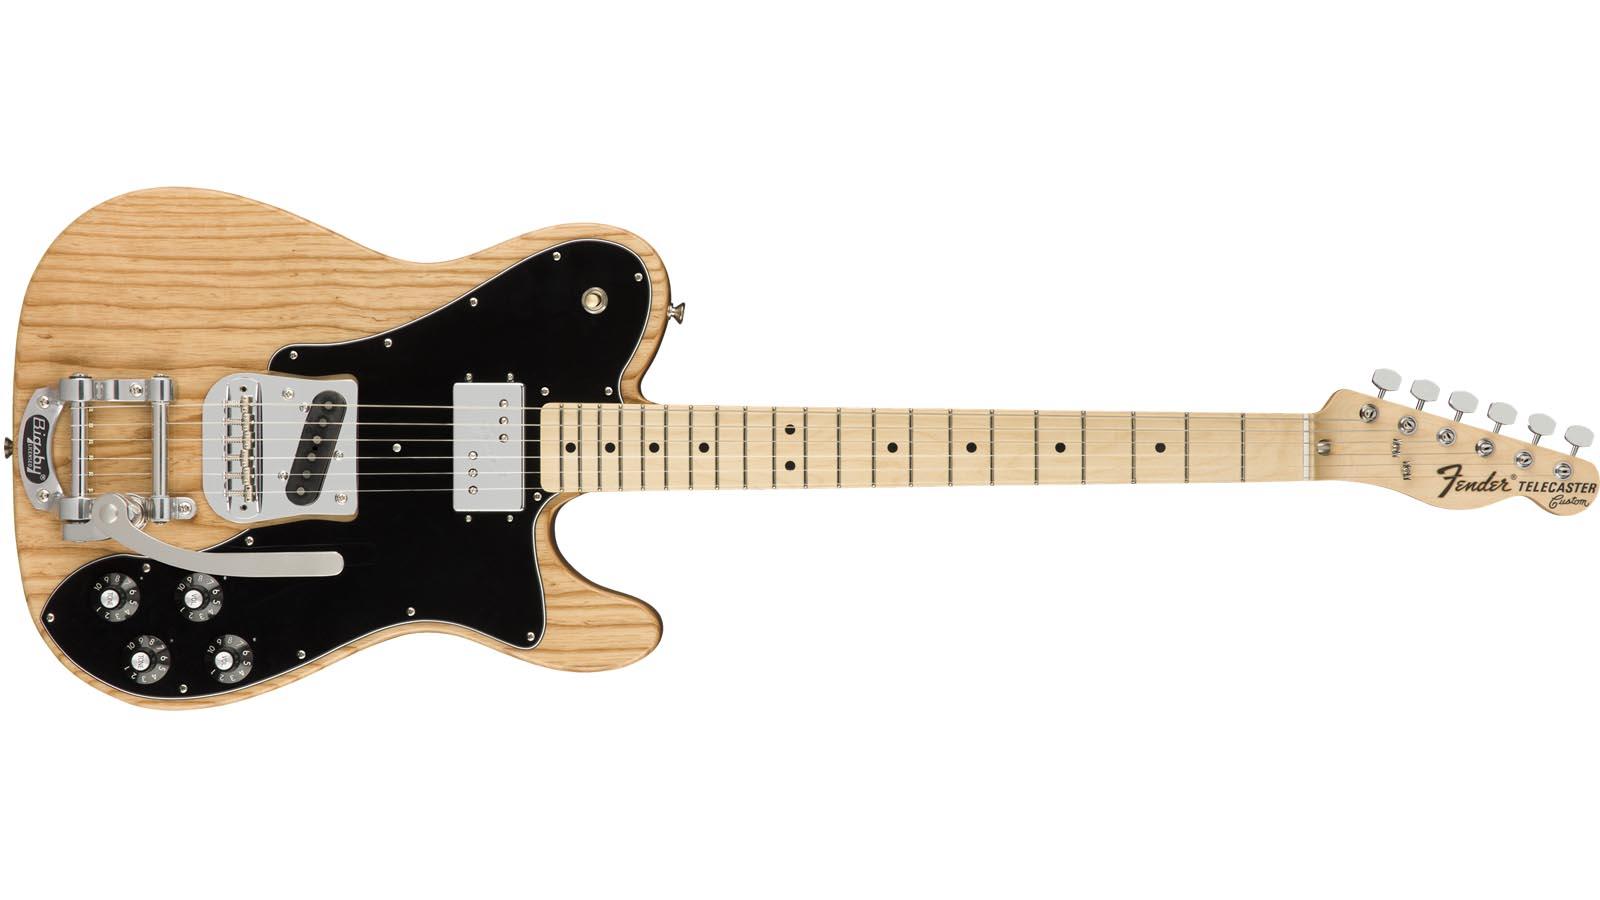 Fender LTD 72 Tele Custom MN Bigsby Natural